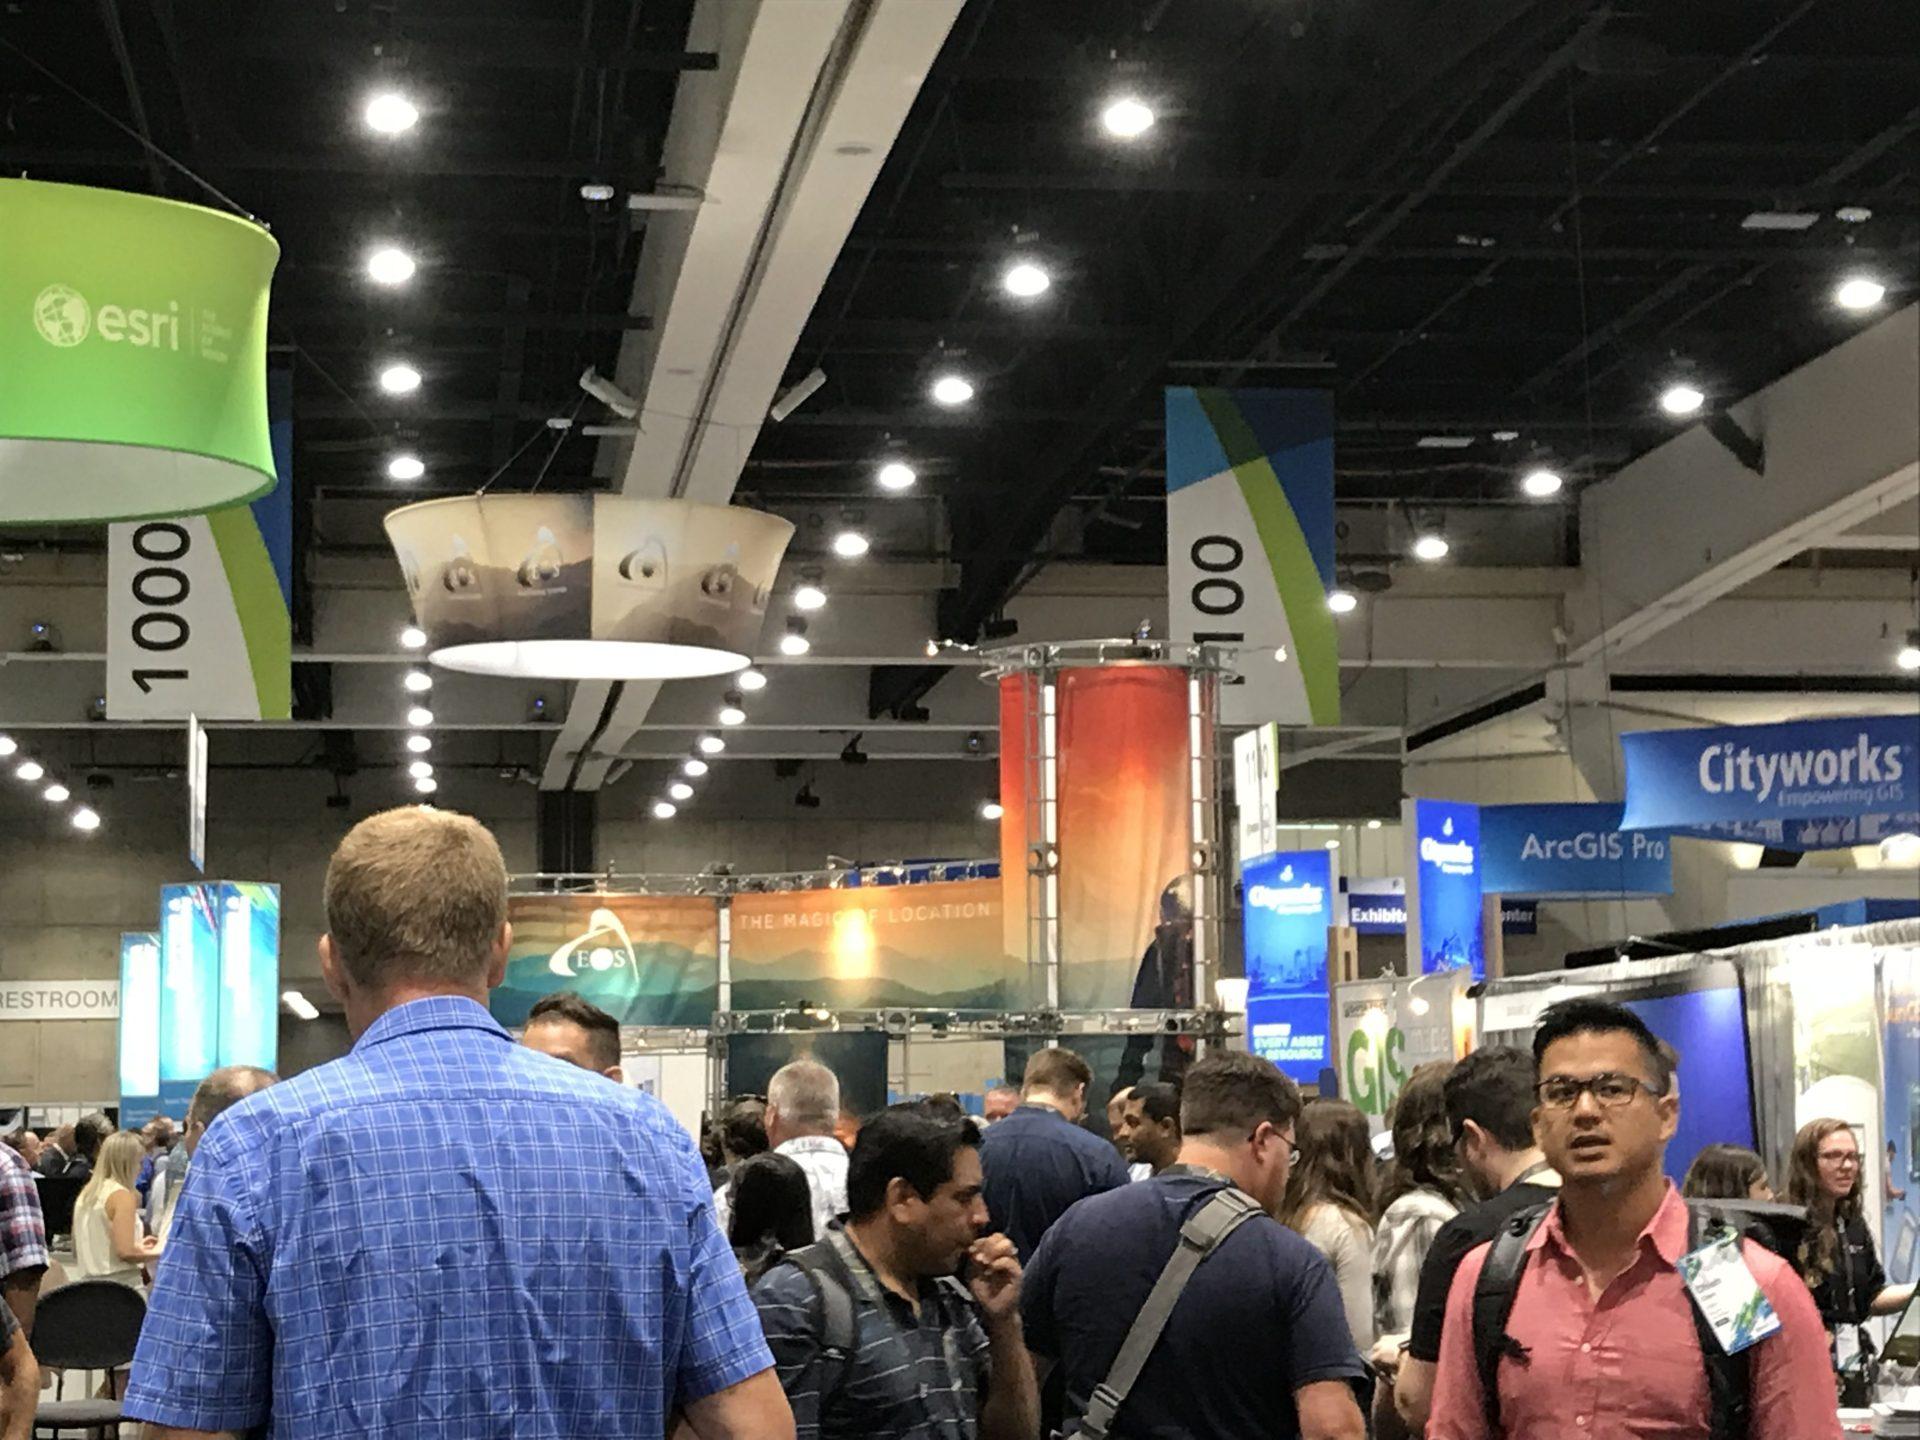 Esri UC Eos Booth Expo 2018-07-10 11.11.25